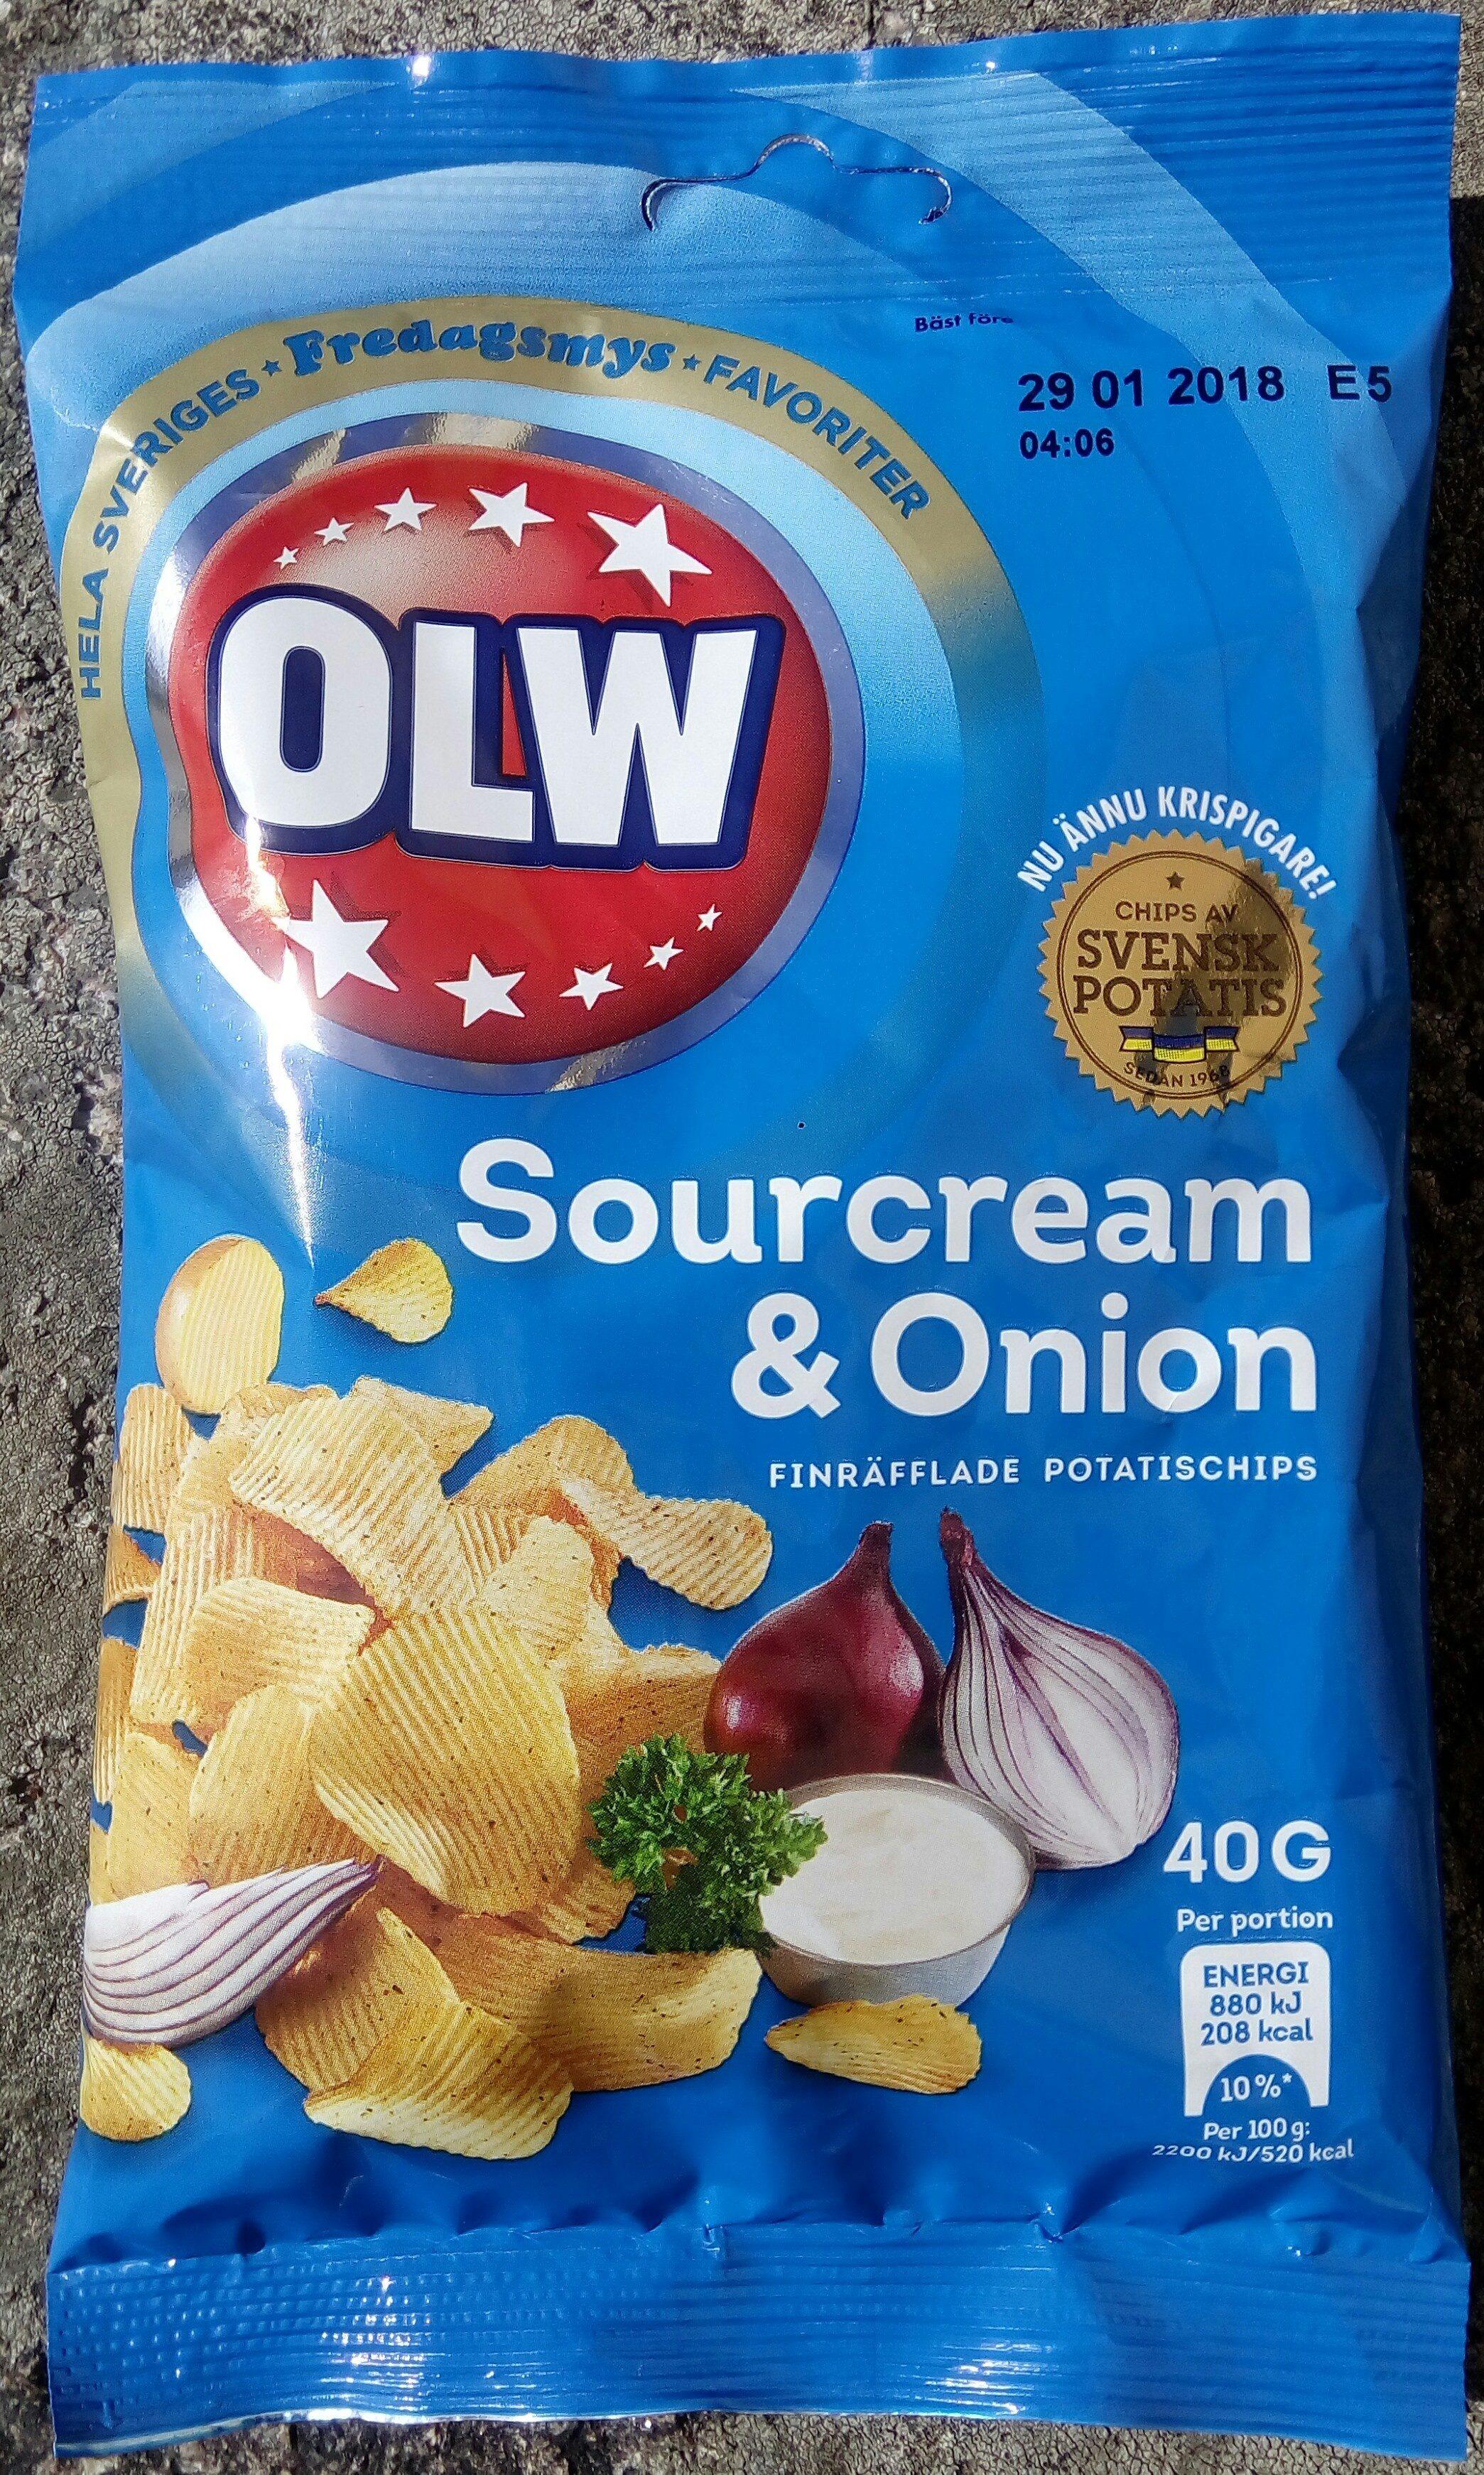 OLW Sourcream & Onion - Product